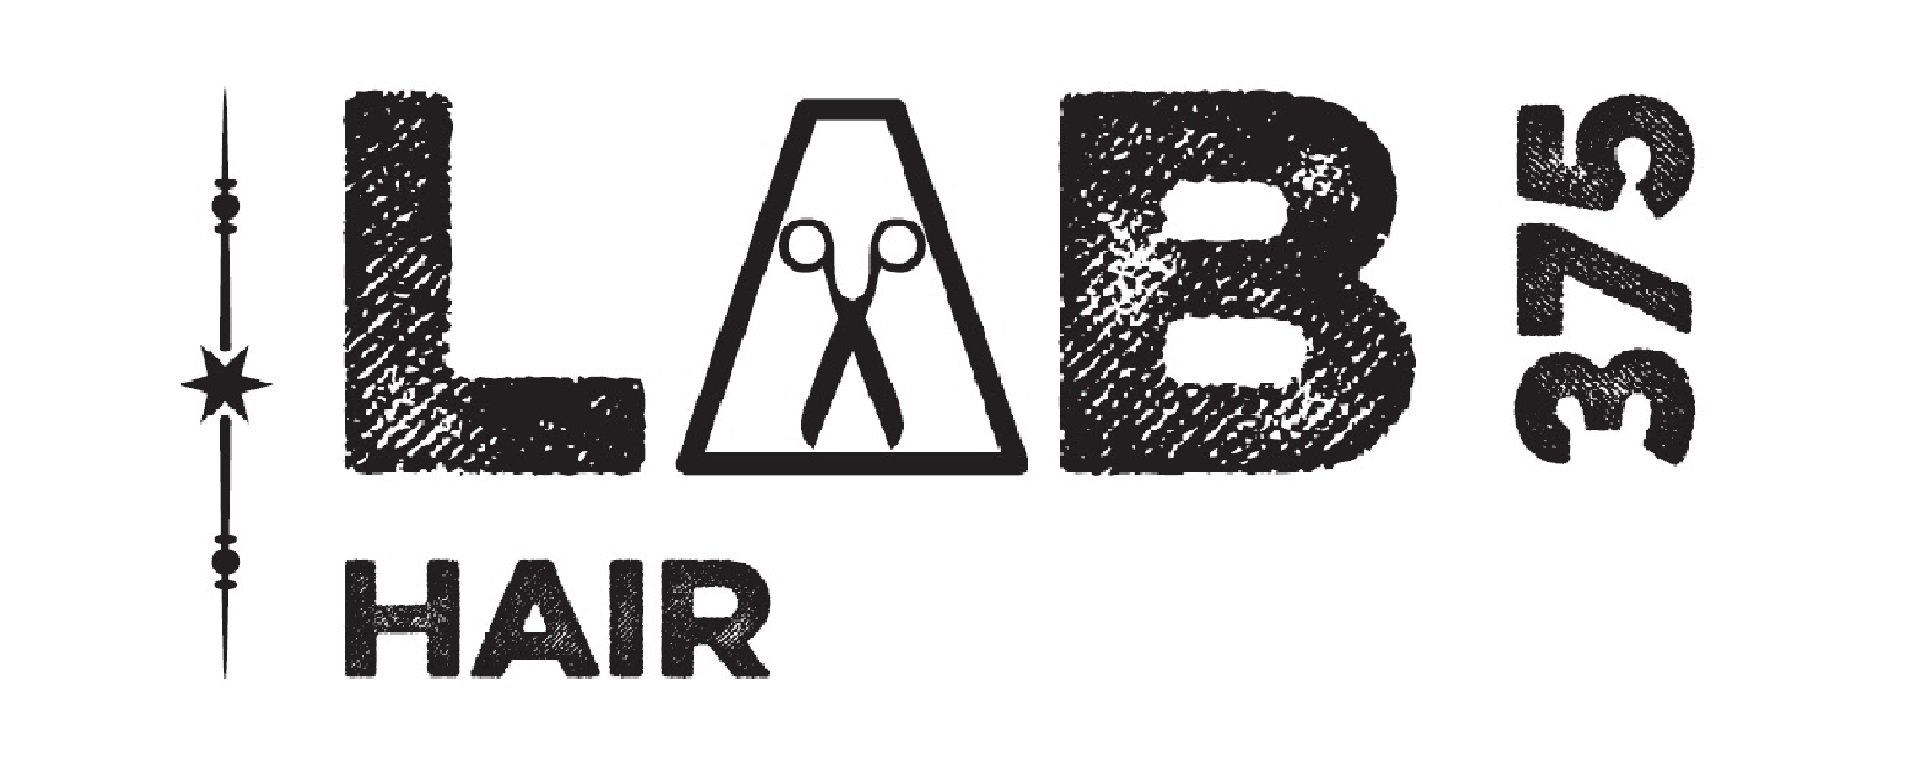 lab375 logo